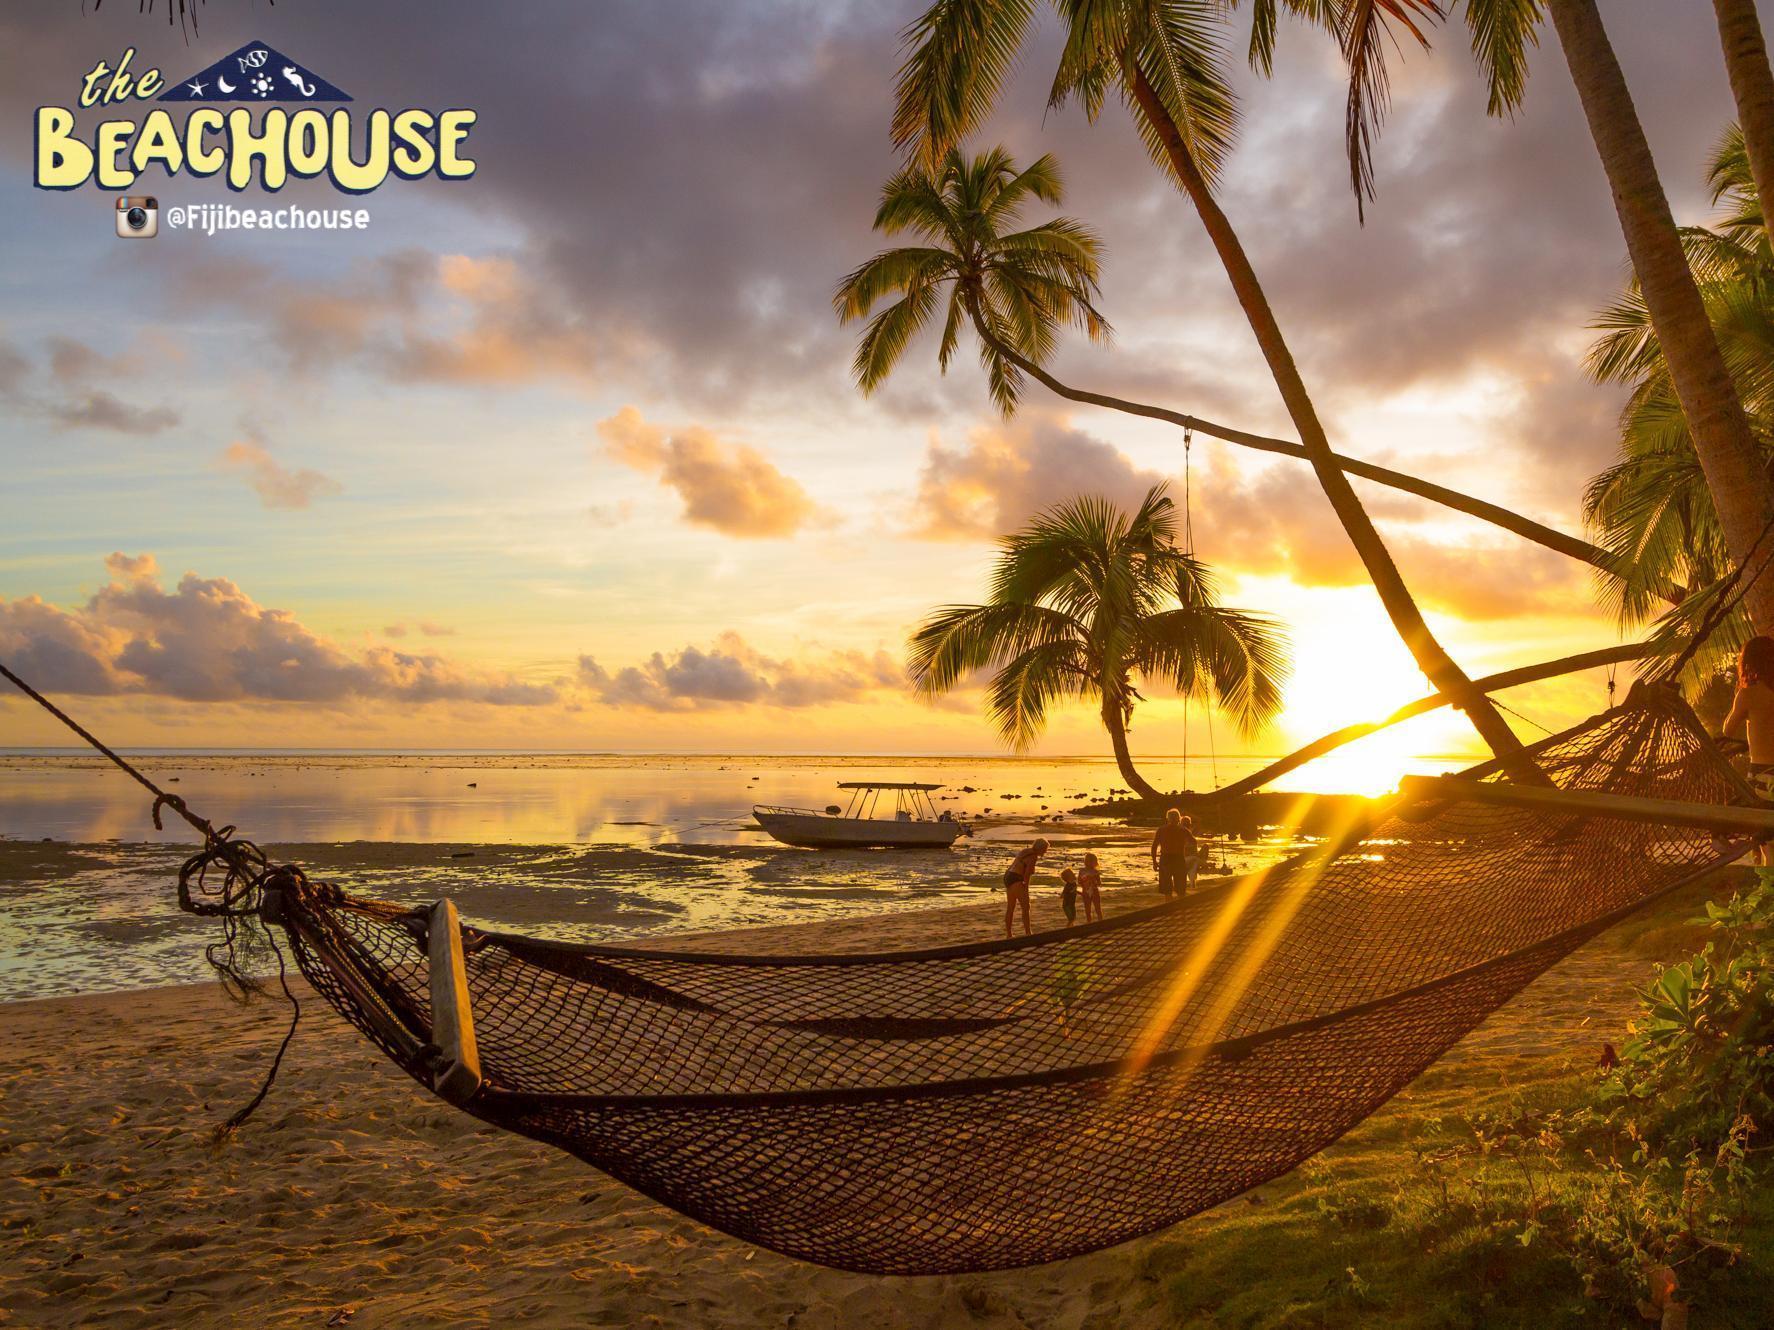 The Beachouse